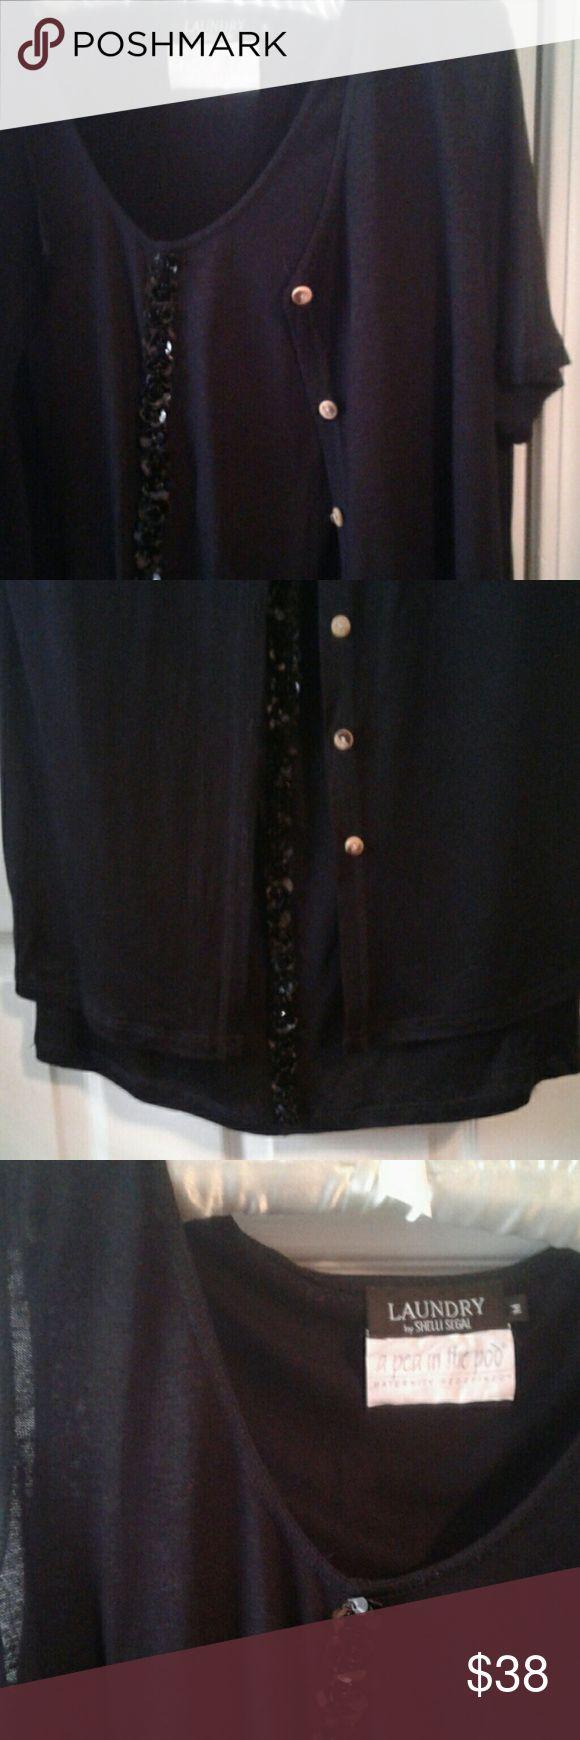 Top 25 best maternity sequin dresses ideas on pinterest shelli segal laundry maternity dress sz m ombrellifo Gallery